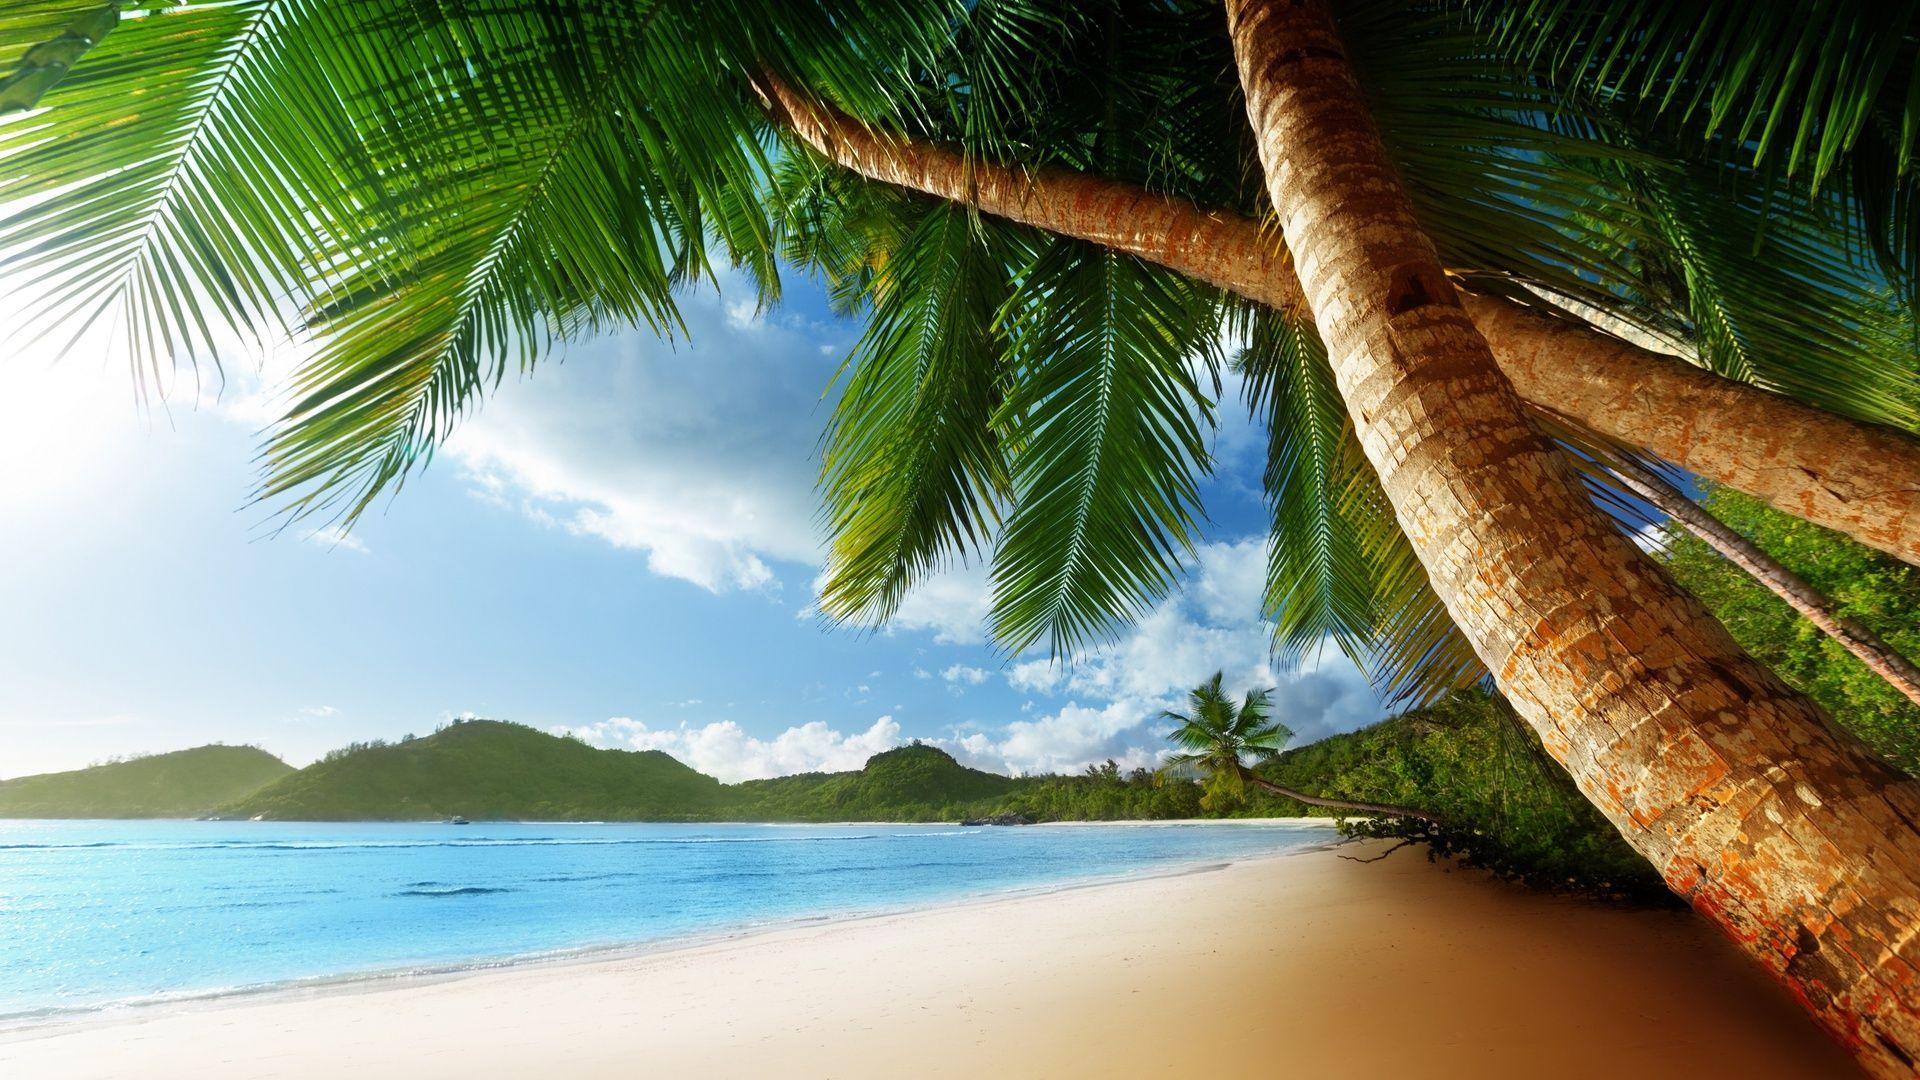 Aloha free download wallpaper